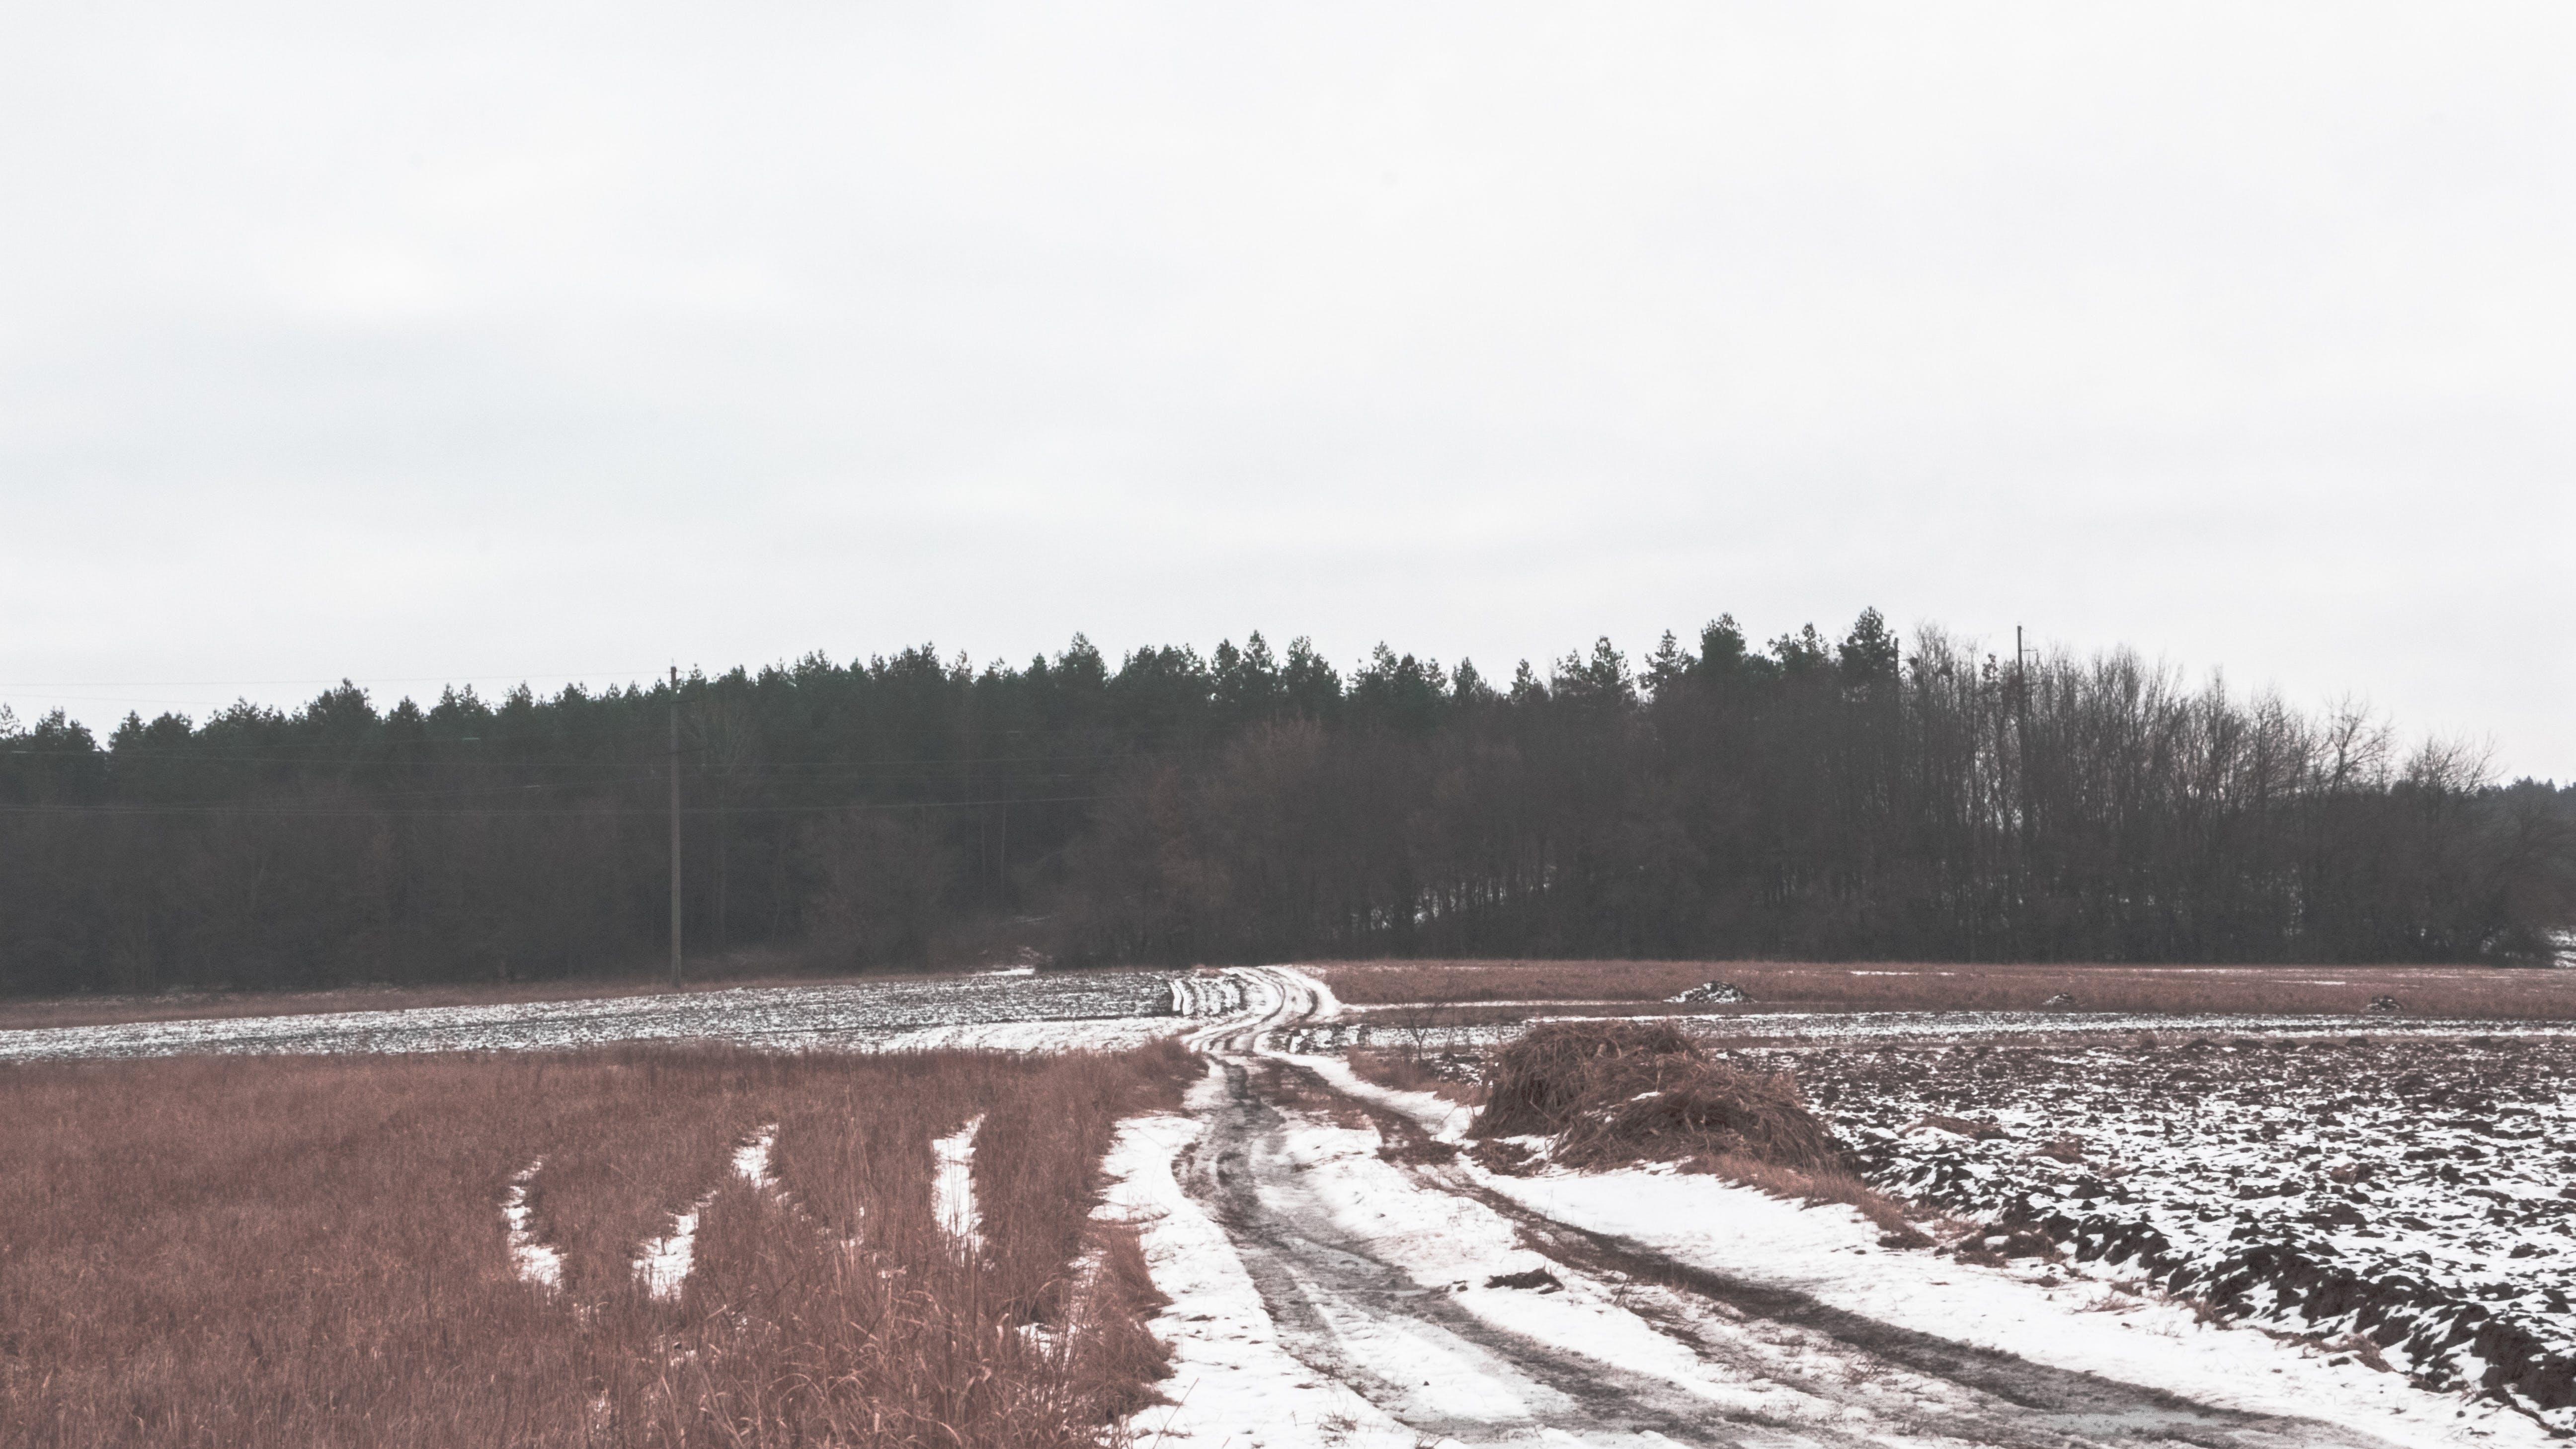 Kostenloses Stock Foto zu feld, heu, land, schnee